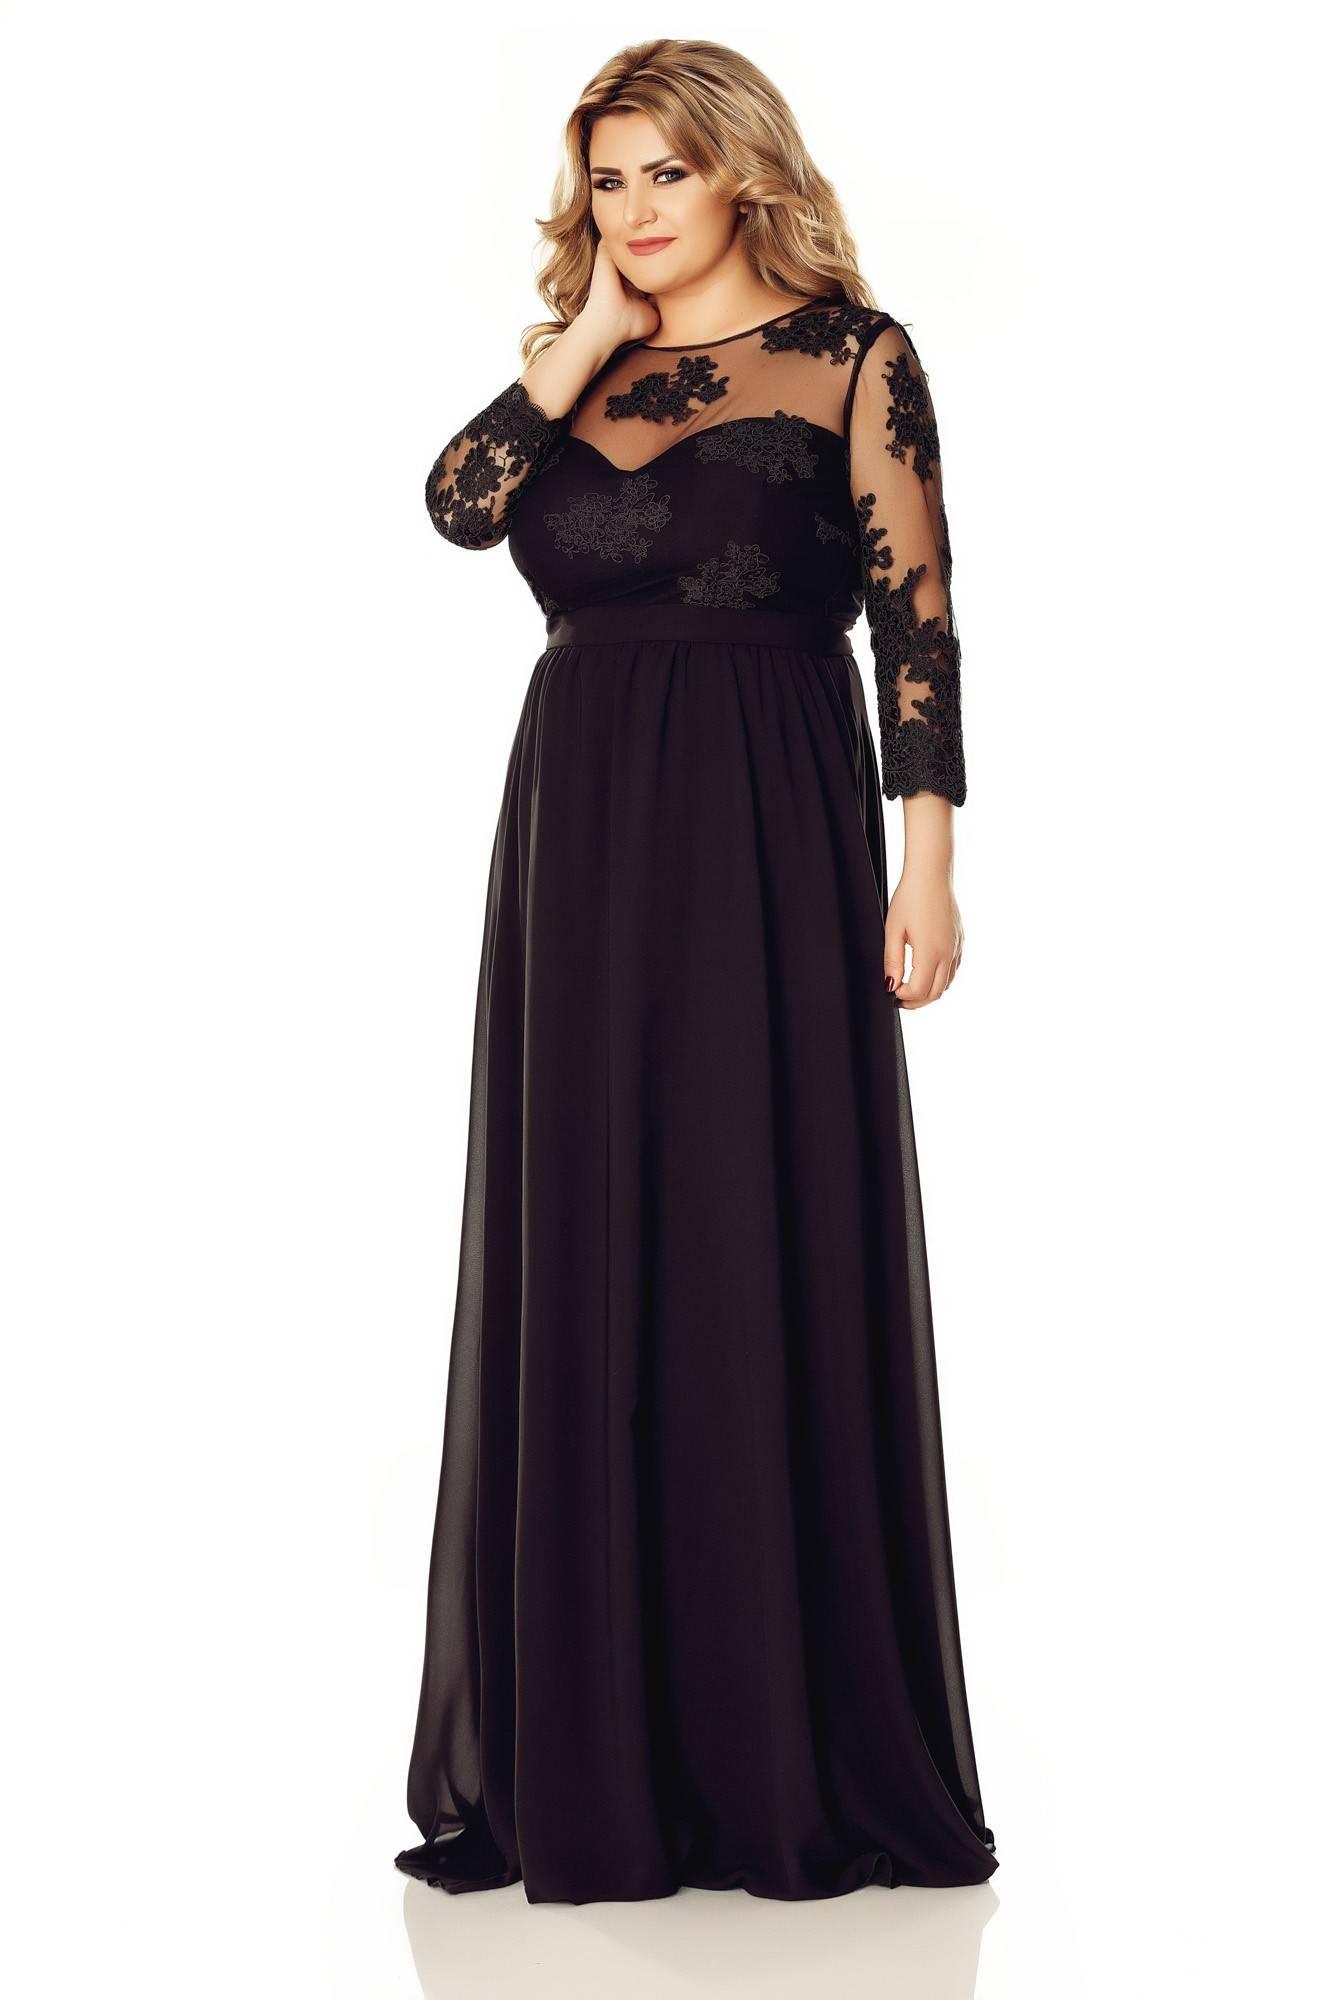 Rochii Elegante Lungi Pentru Femei Plinute